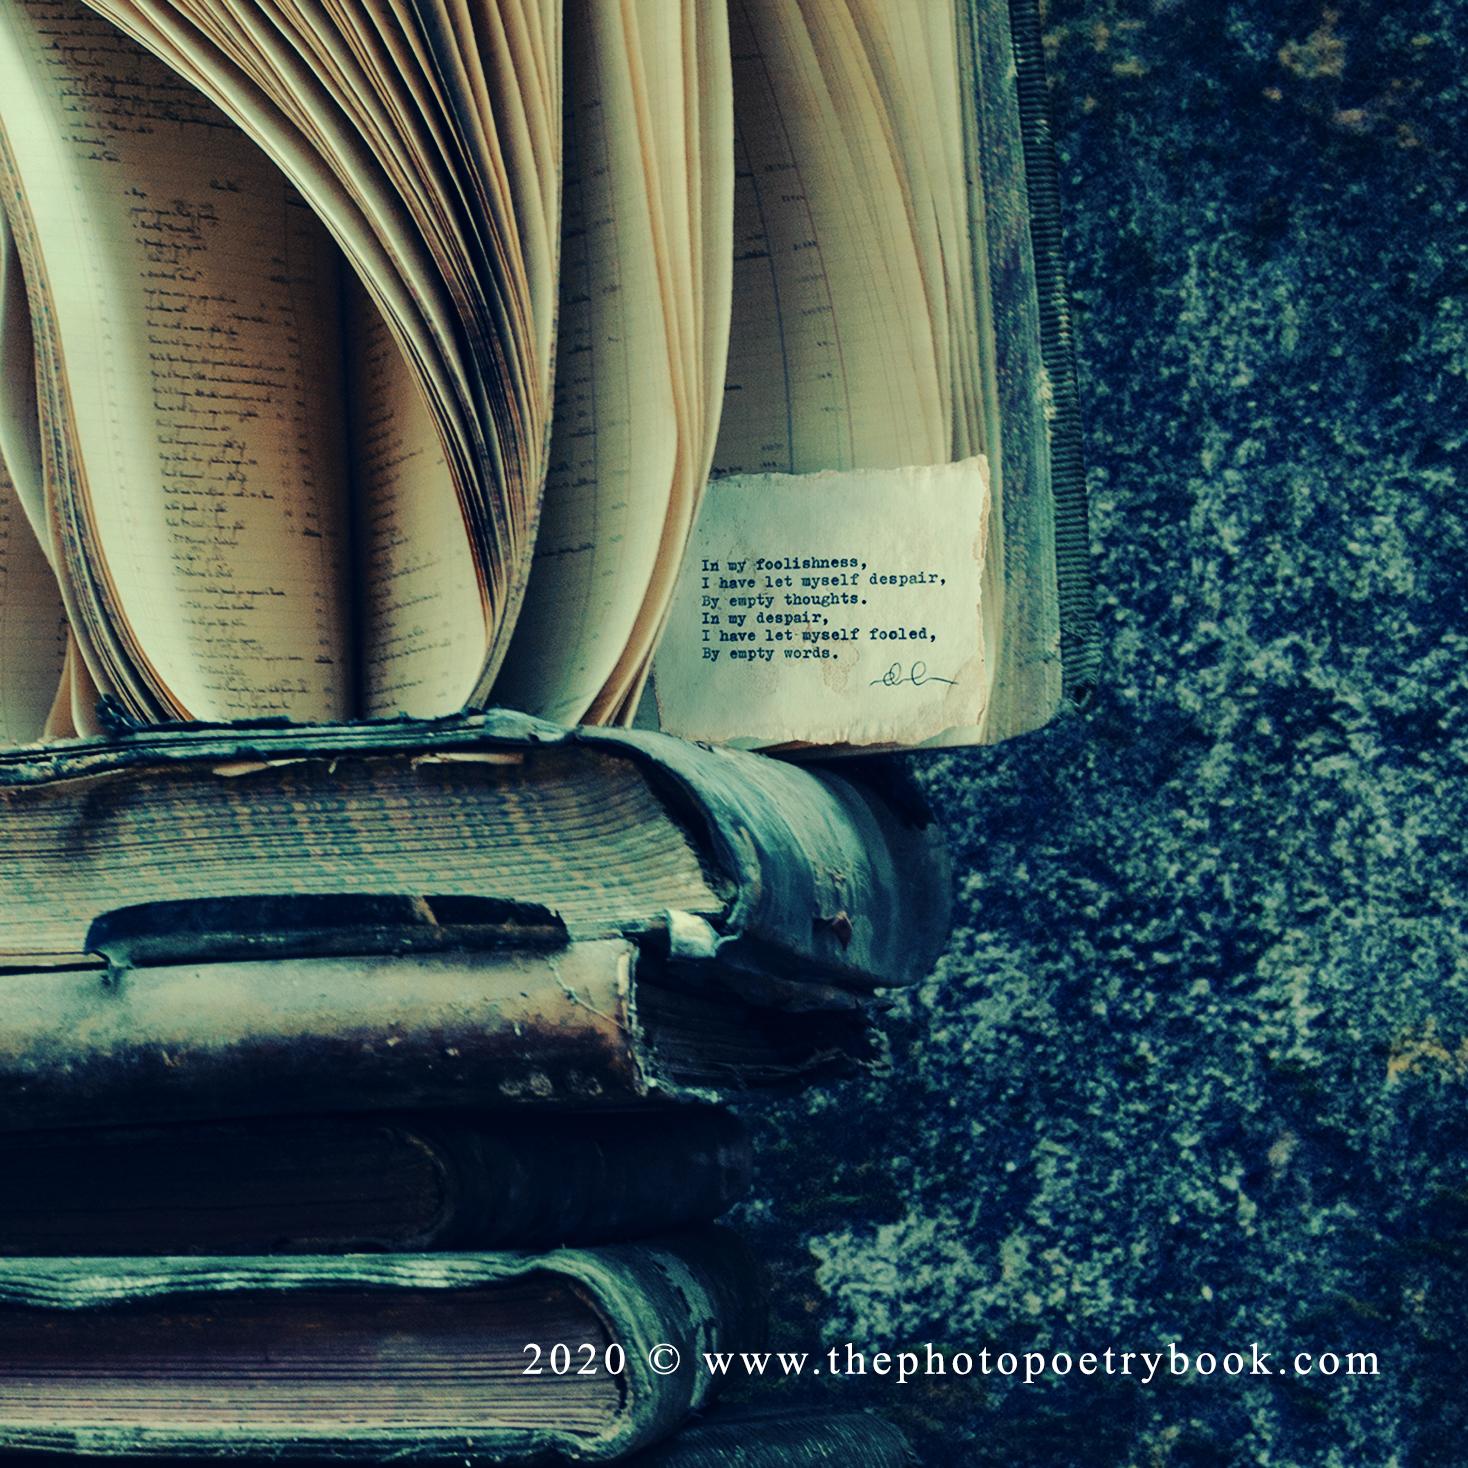 Daciana Lipai - Burdeden a Photopoem - Isolation Series